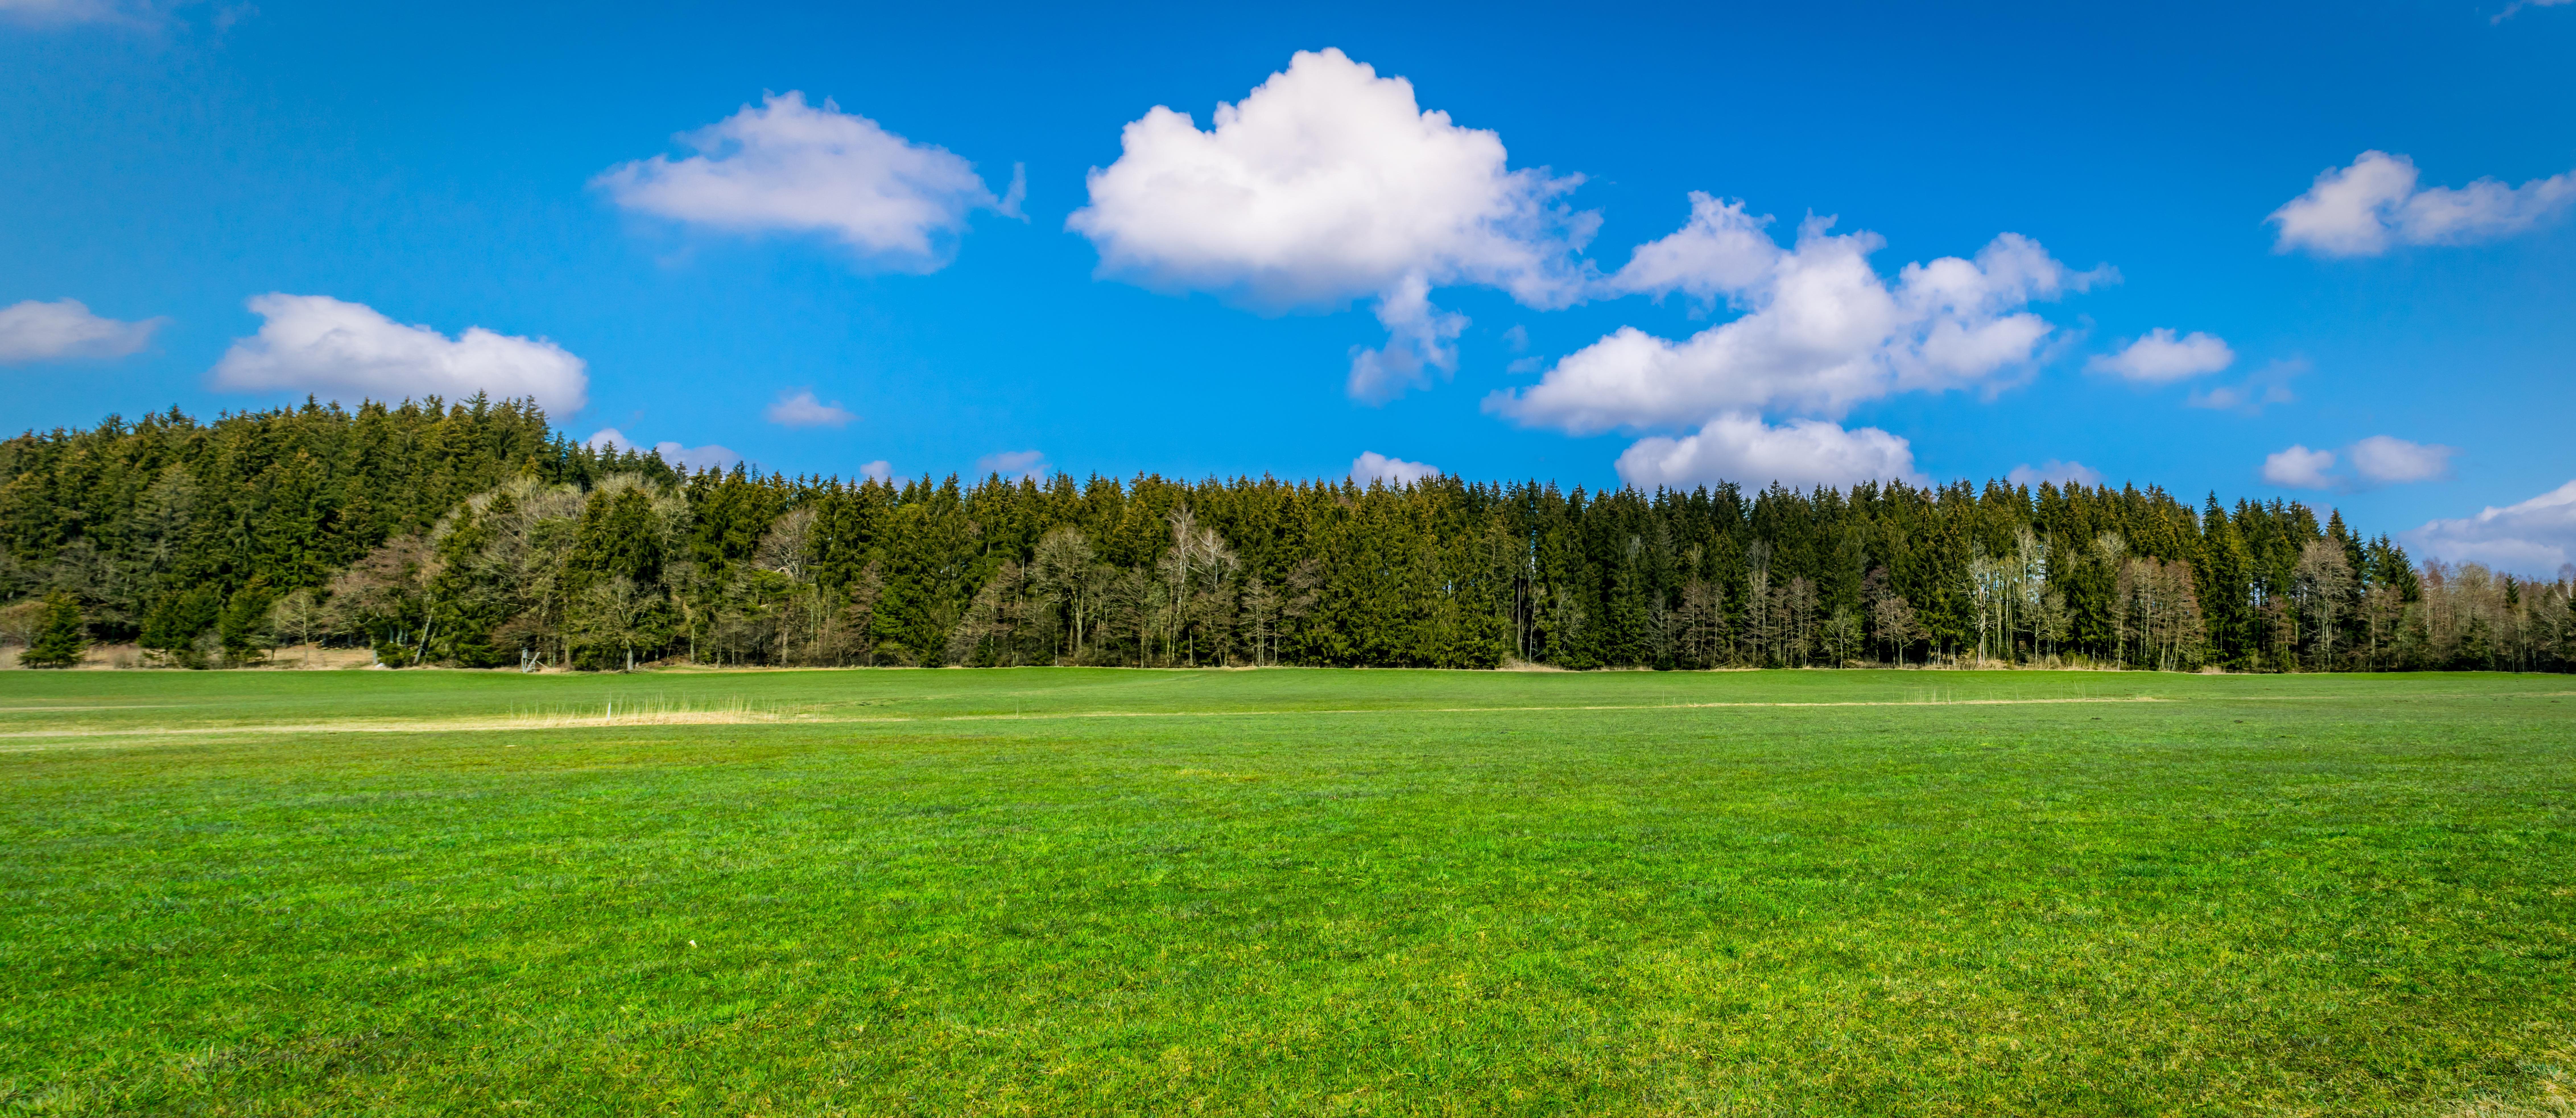 Free Images : tree, nature, grass, horizon, cloud ...